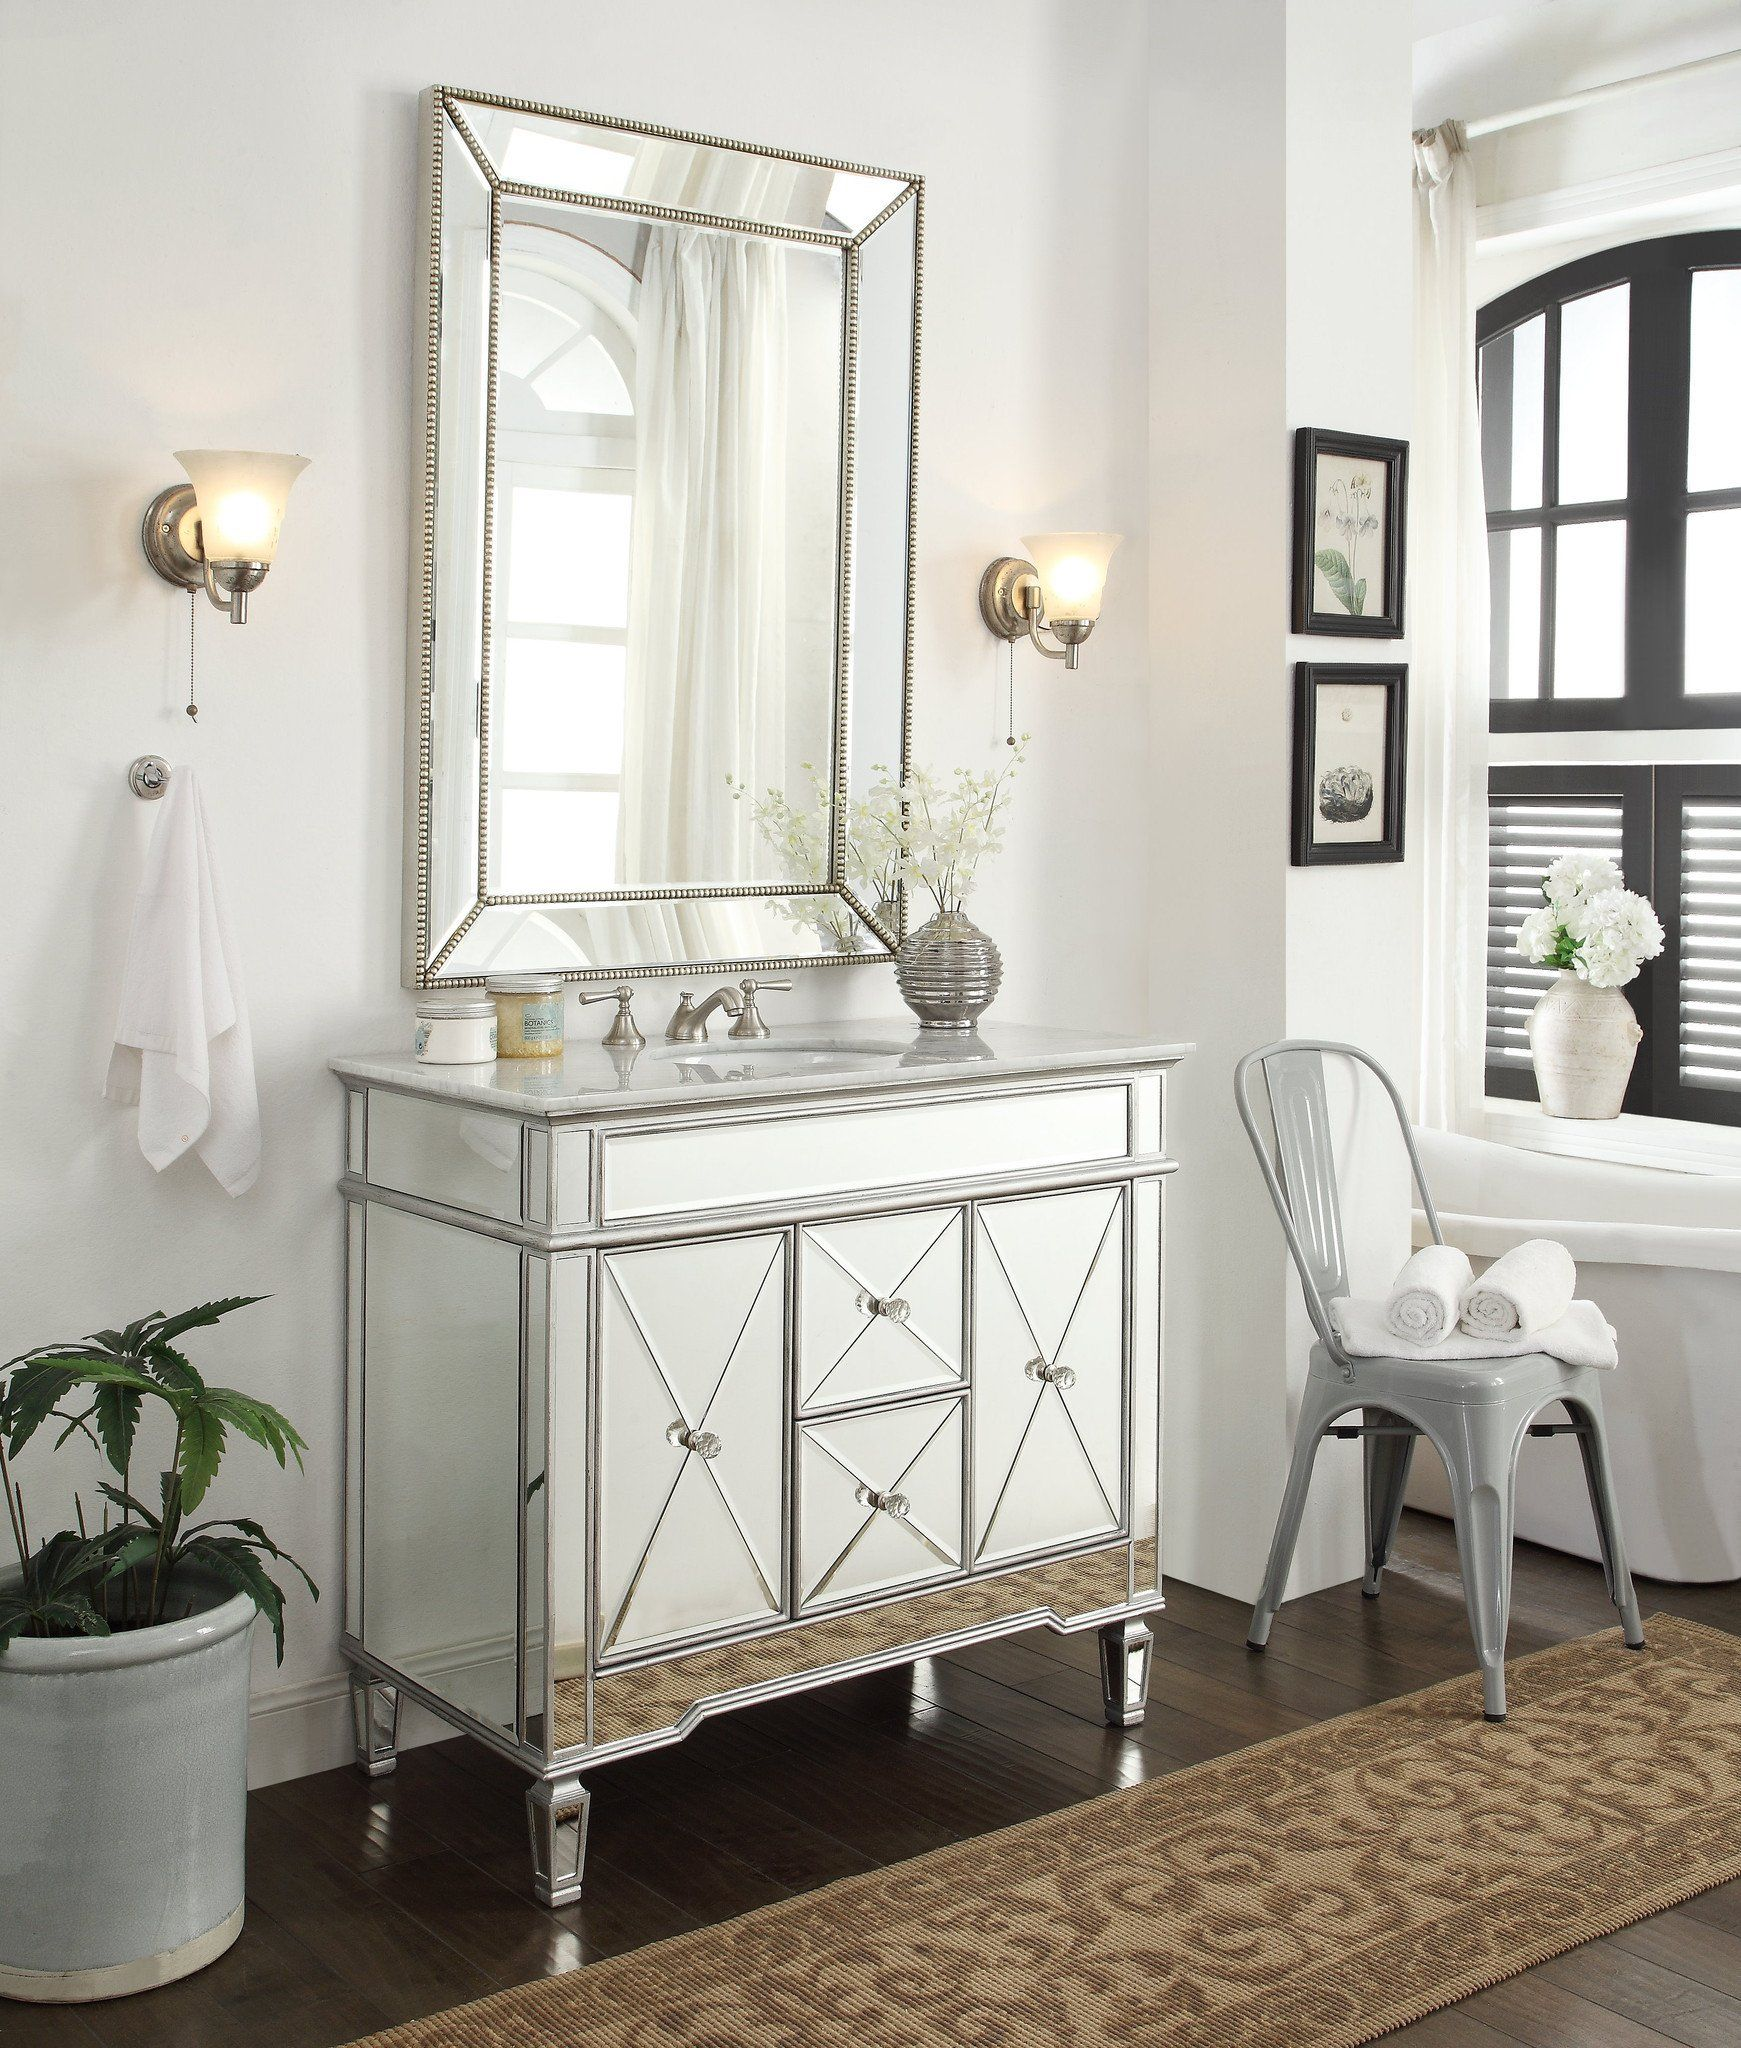 ravalli wall mirror mr 2385 3042 in 2019 products bathroom rh pinterest com